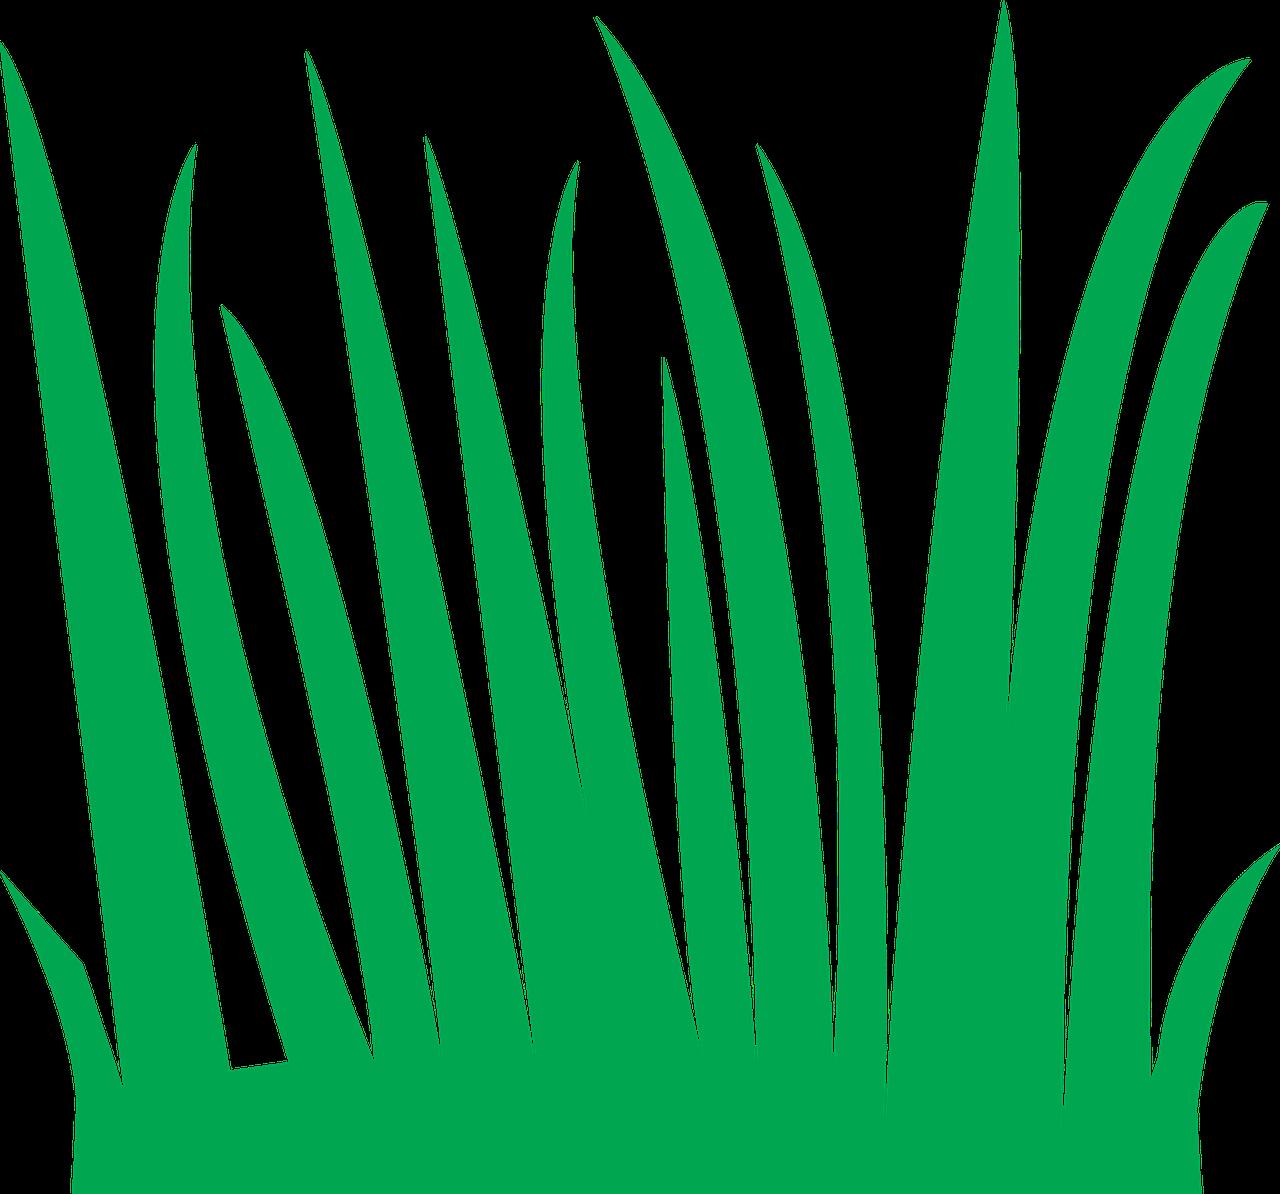 Green nature meadow field. Clipart grass bulletin board